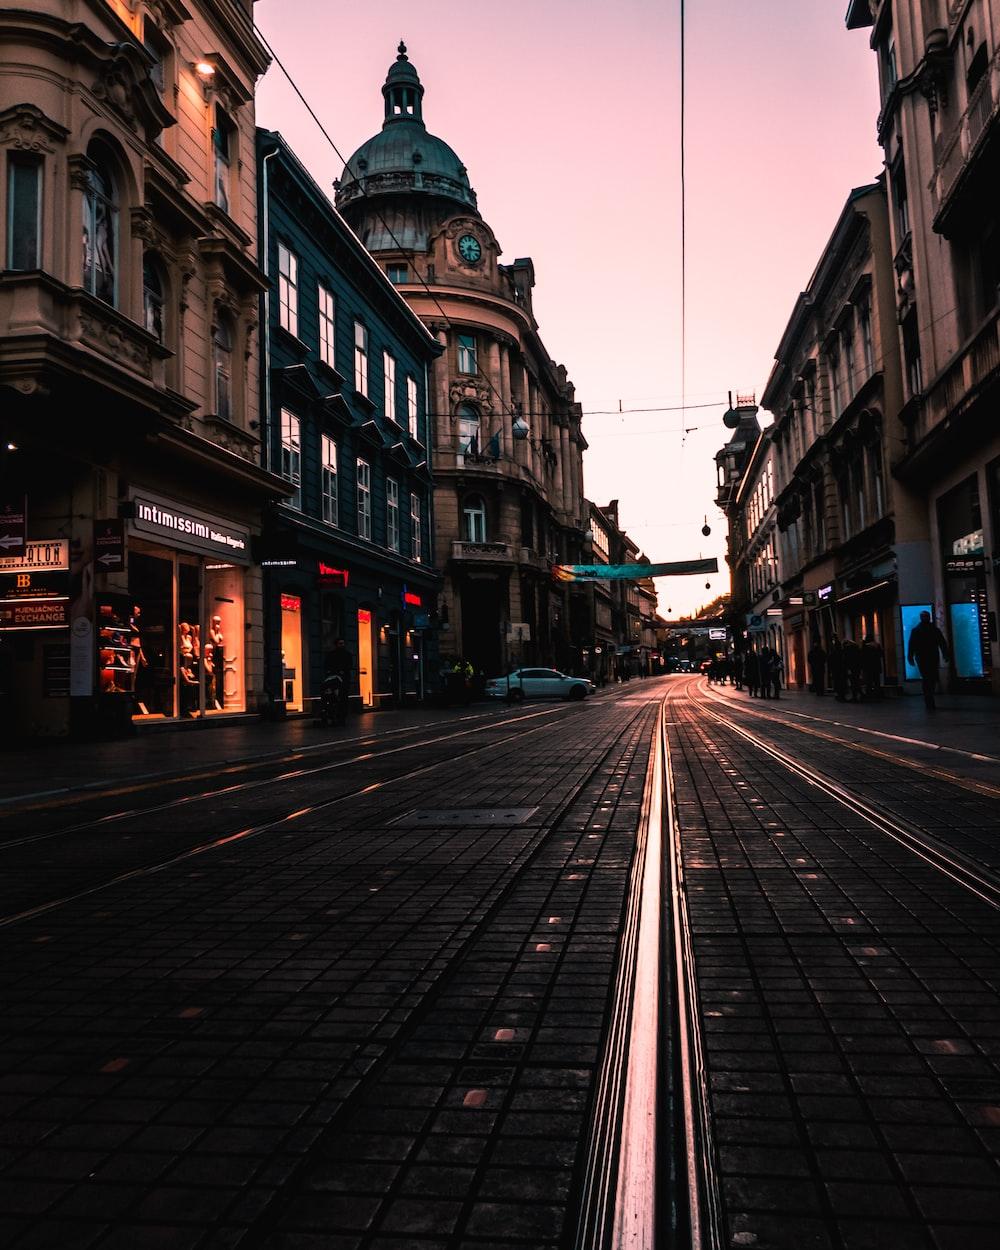 black concrete road between buildings at golden hour